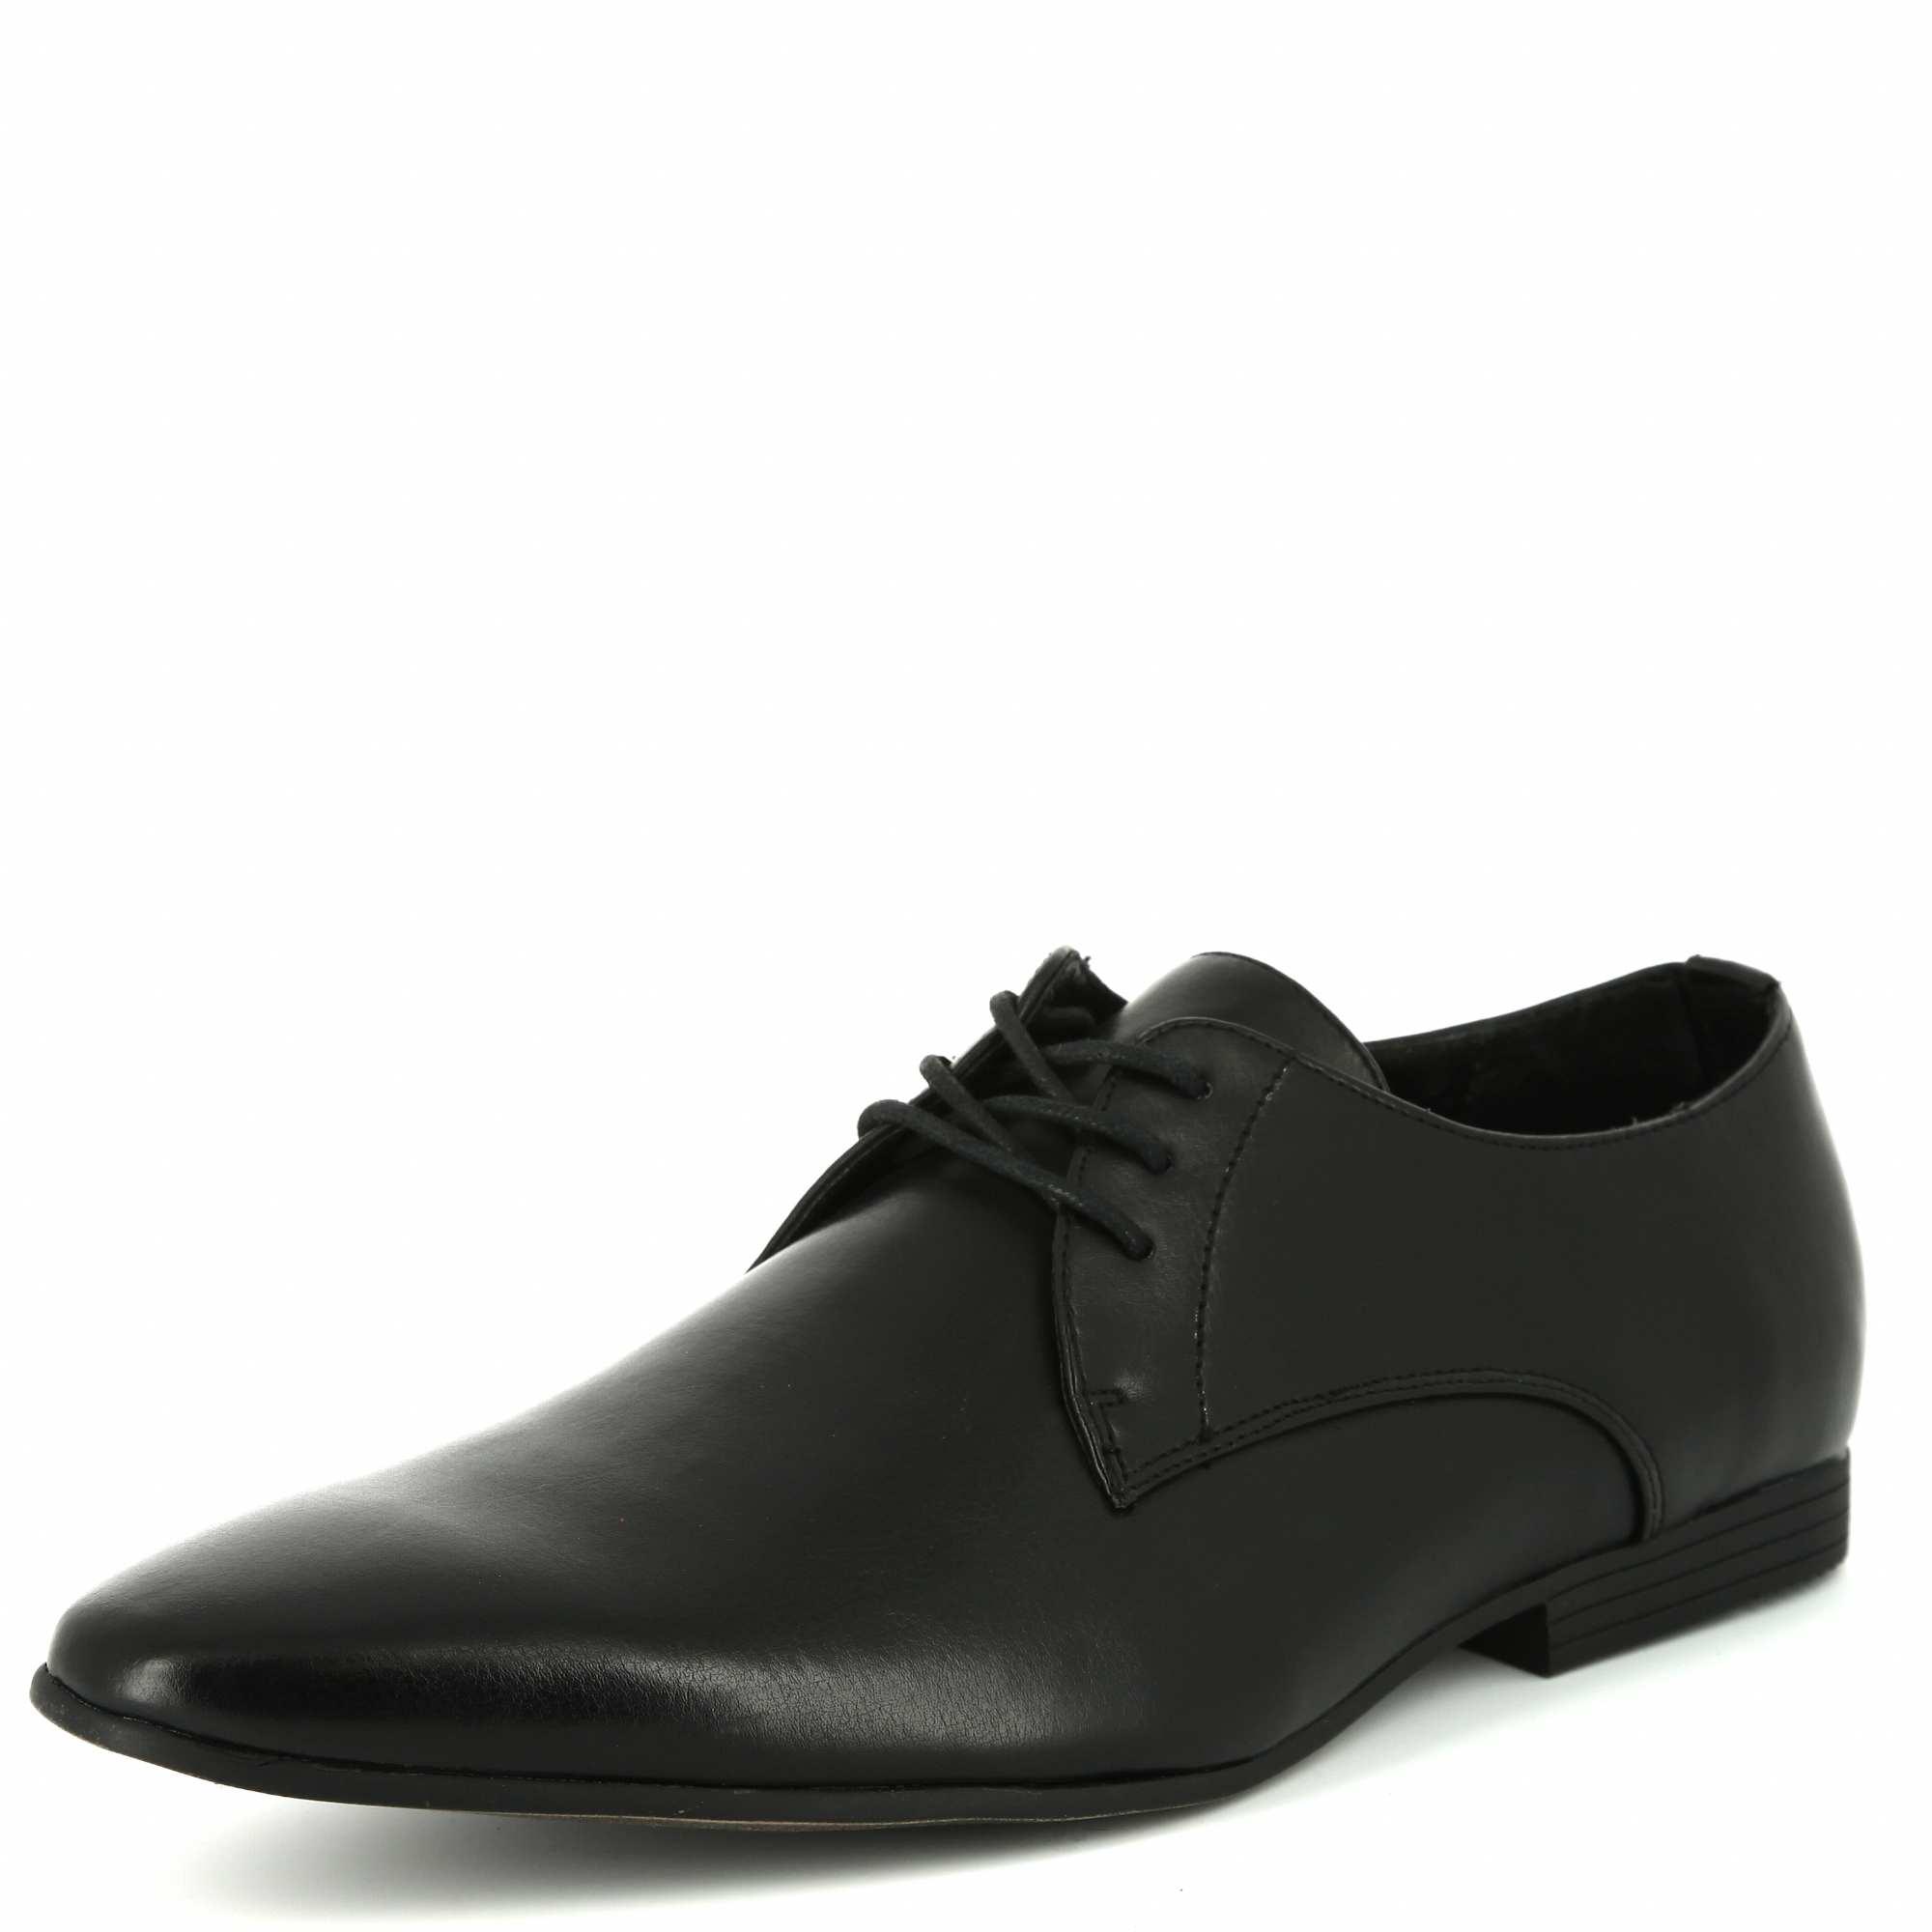 4b4a386b5 Zapatos de vestir Hombre - negro - Kiabi - 28